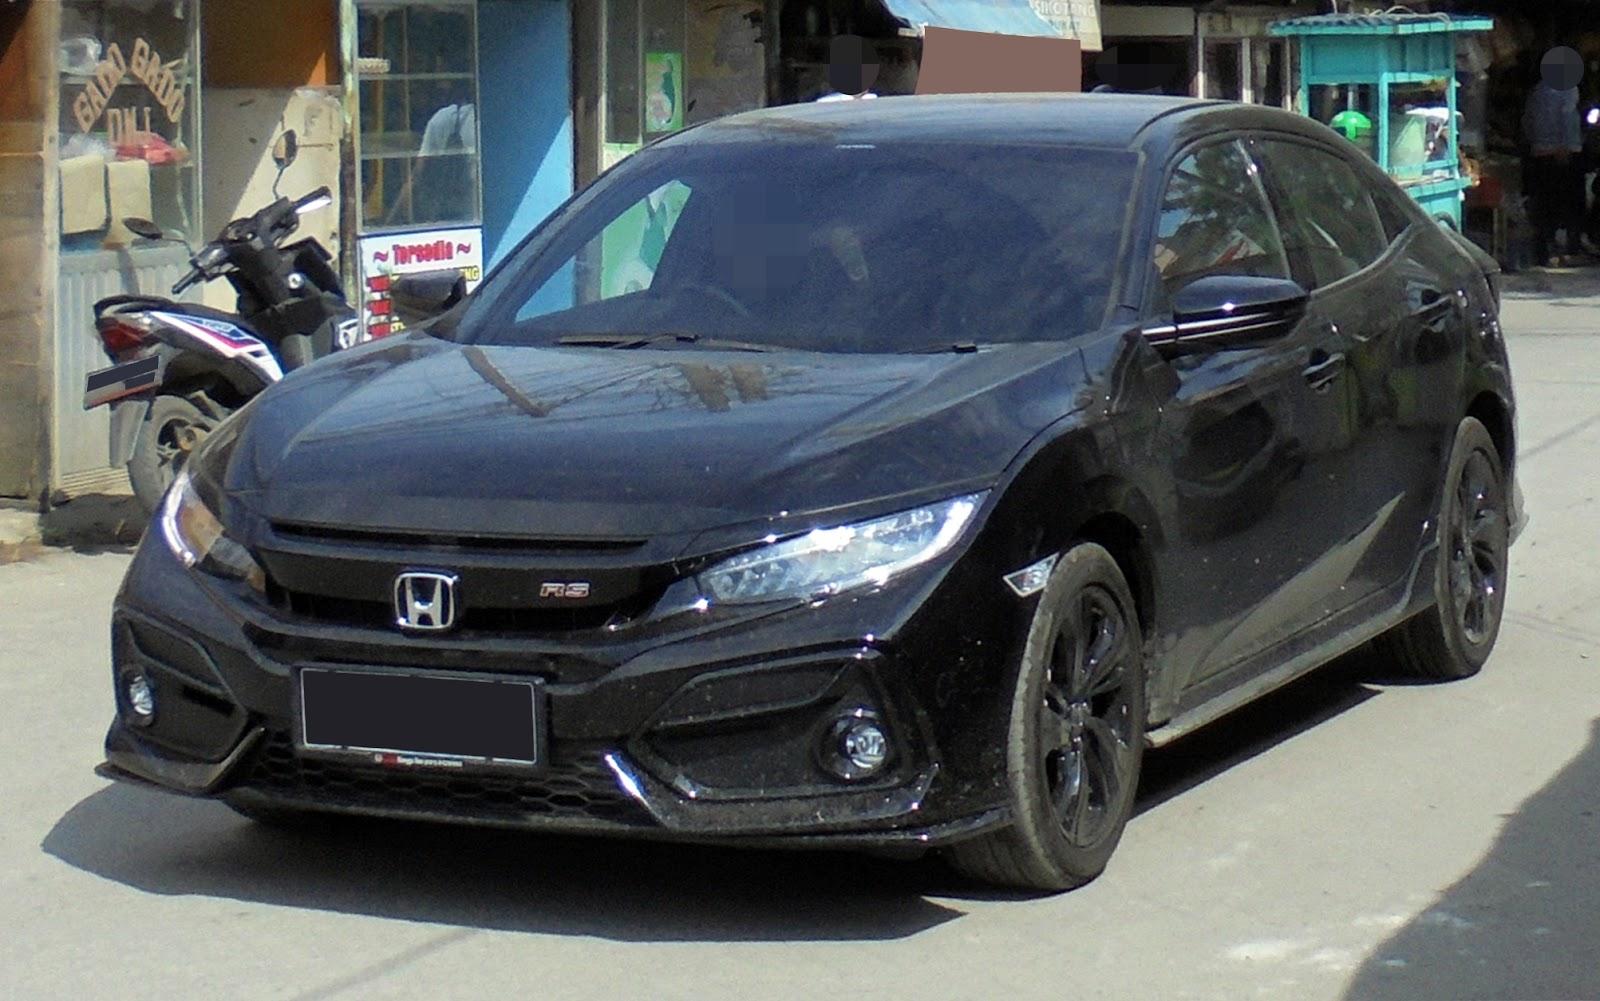 Photo of 2021 Honda Civic hatchbakck parked on city street